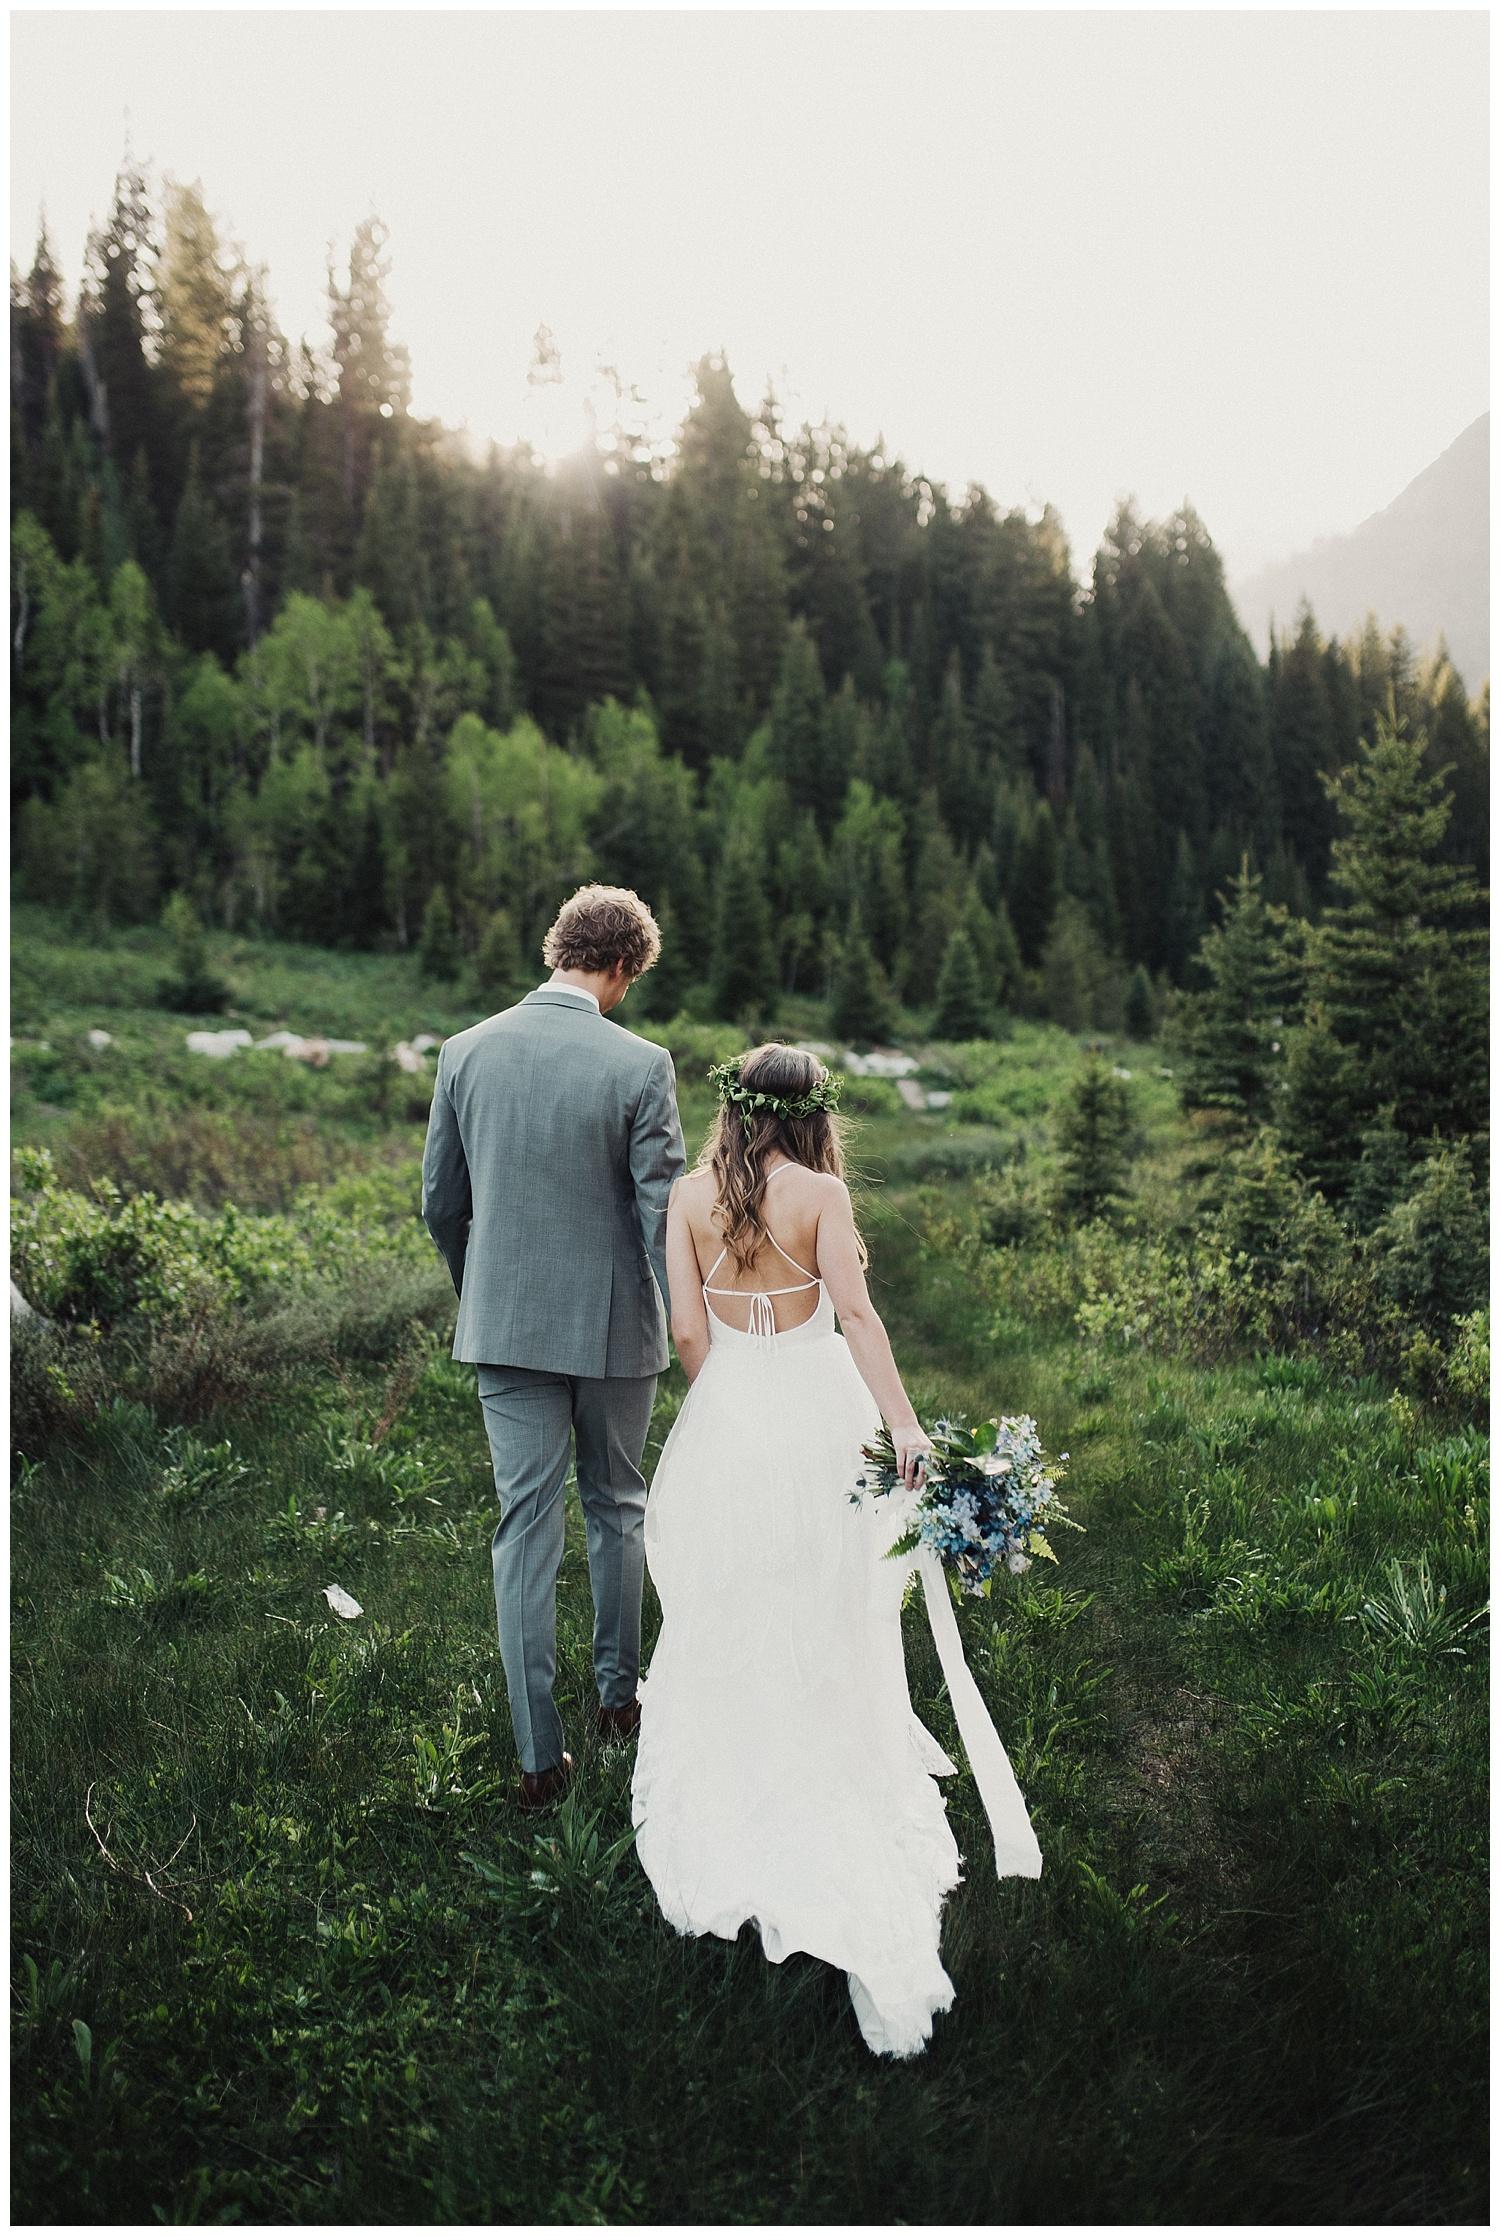 Jordan Pines Bridals in Big Cottonwood Canyon